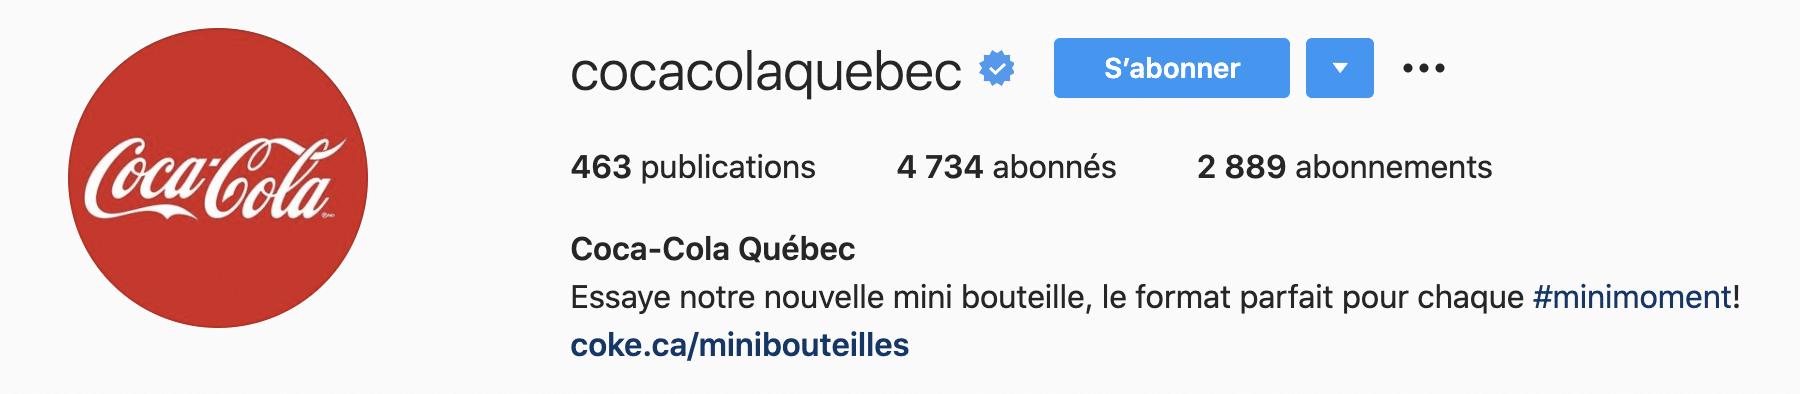 coca cola example hashtag